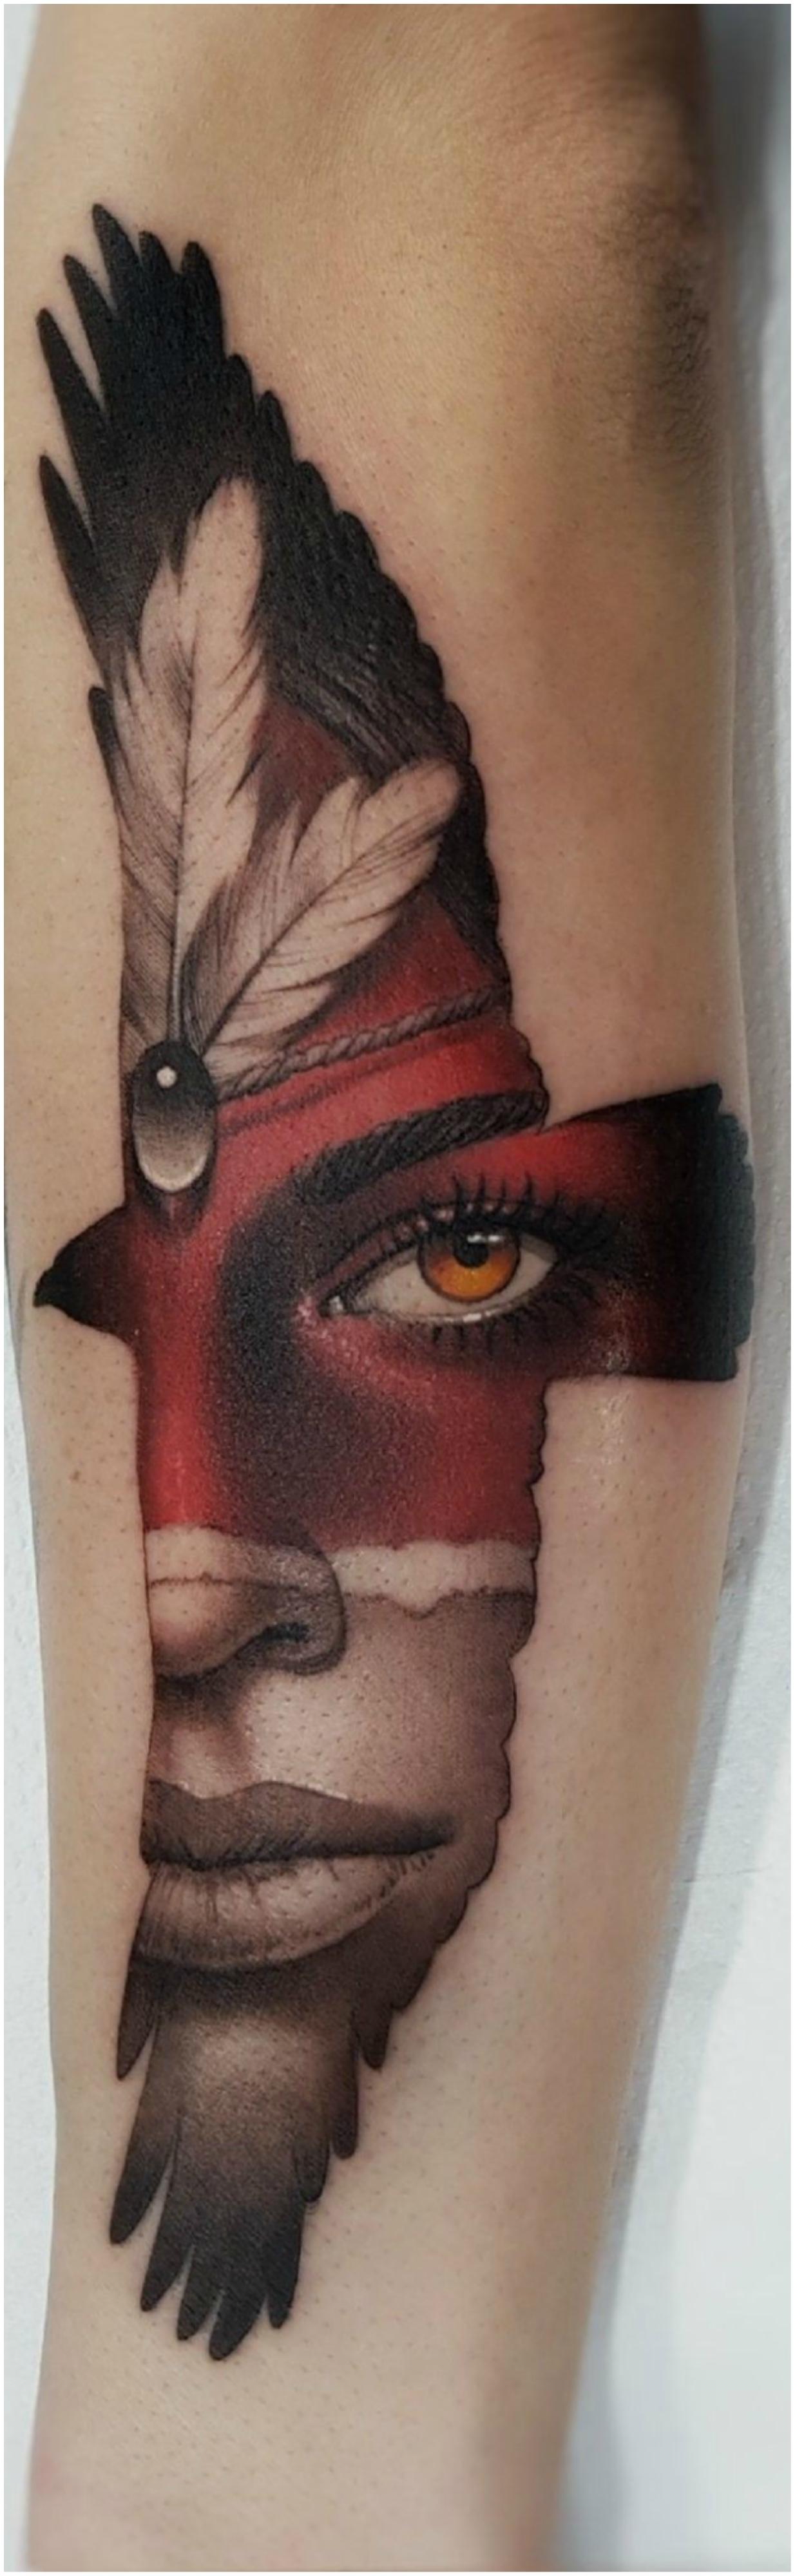 American Tattoo (3)